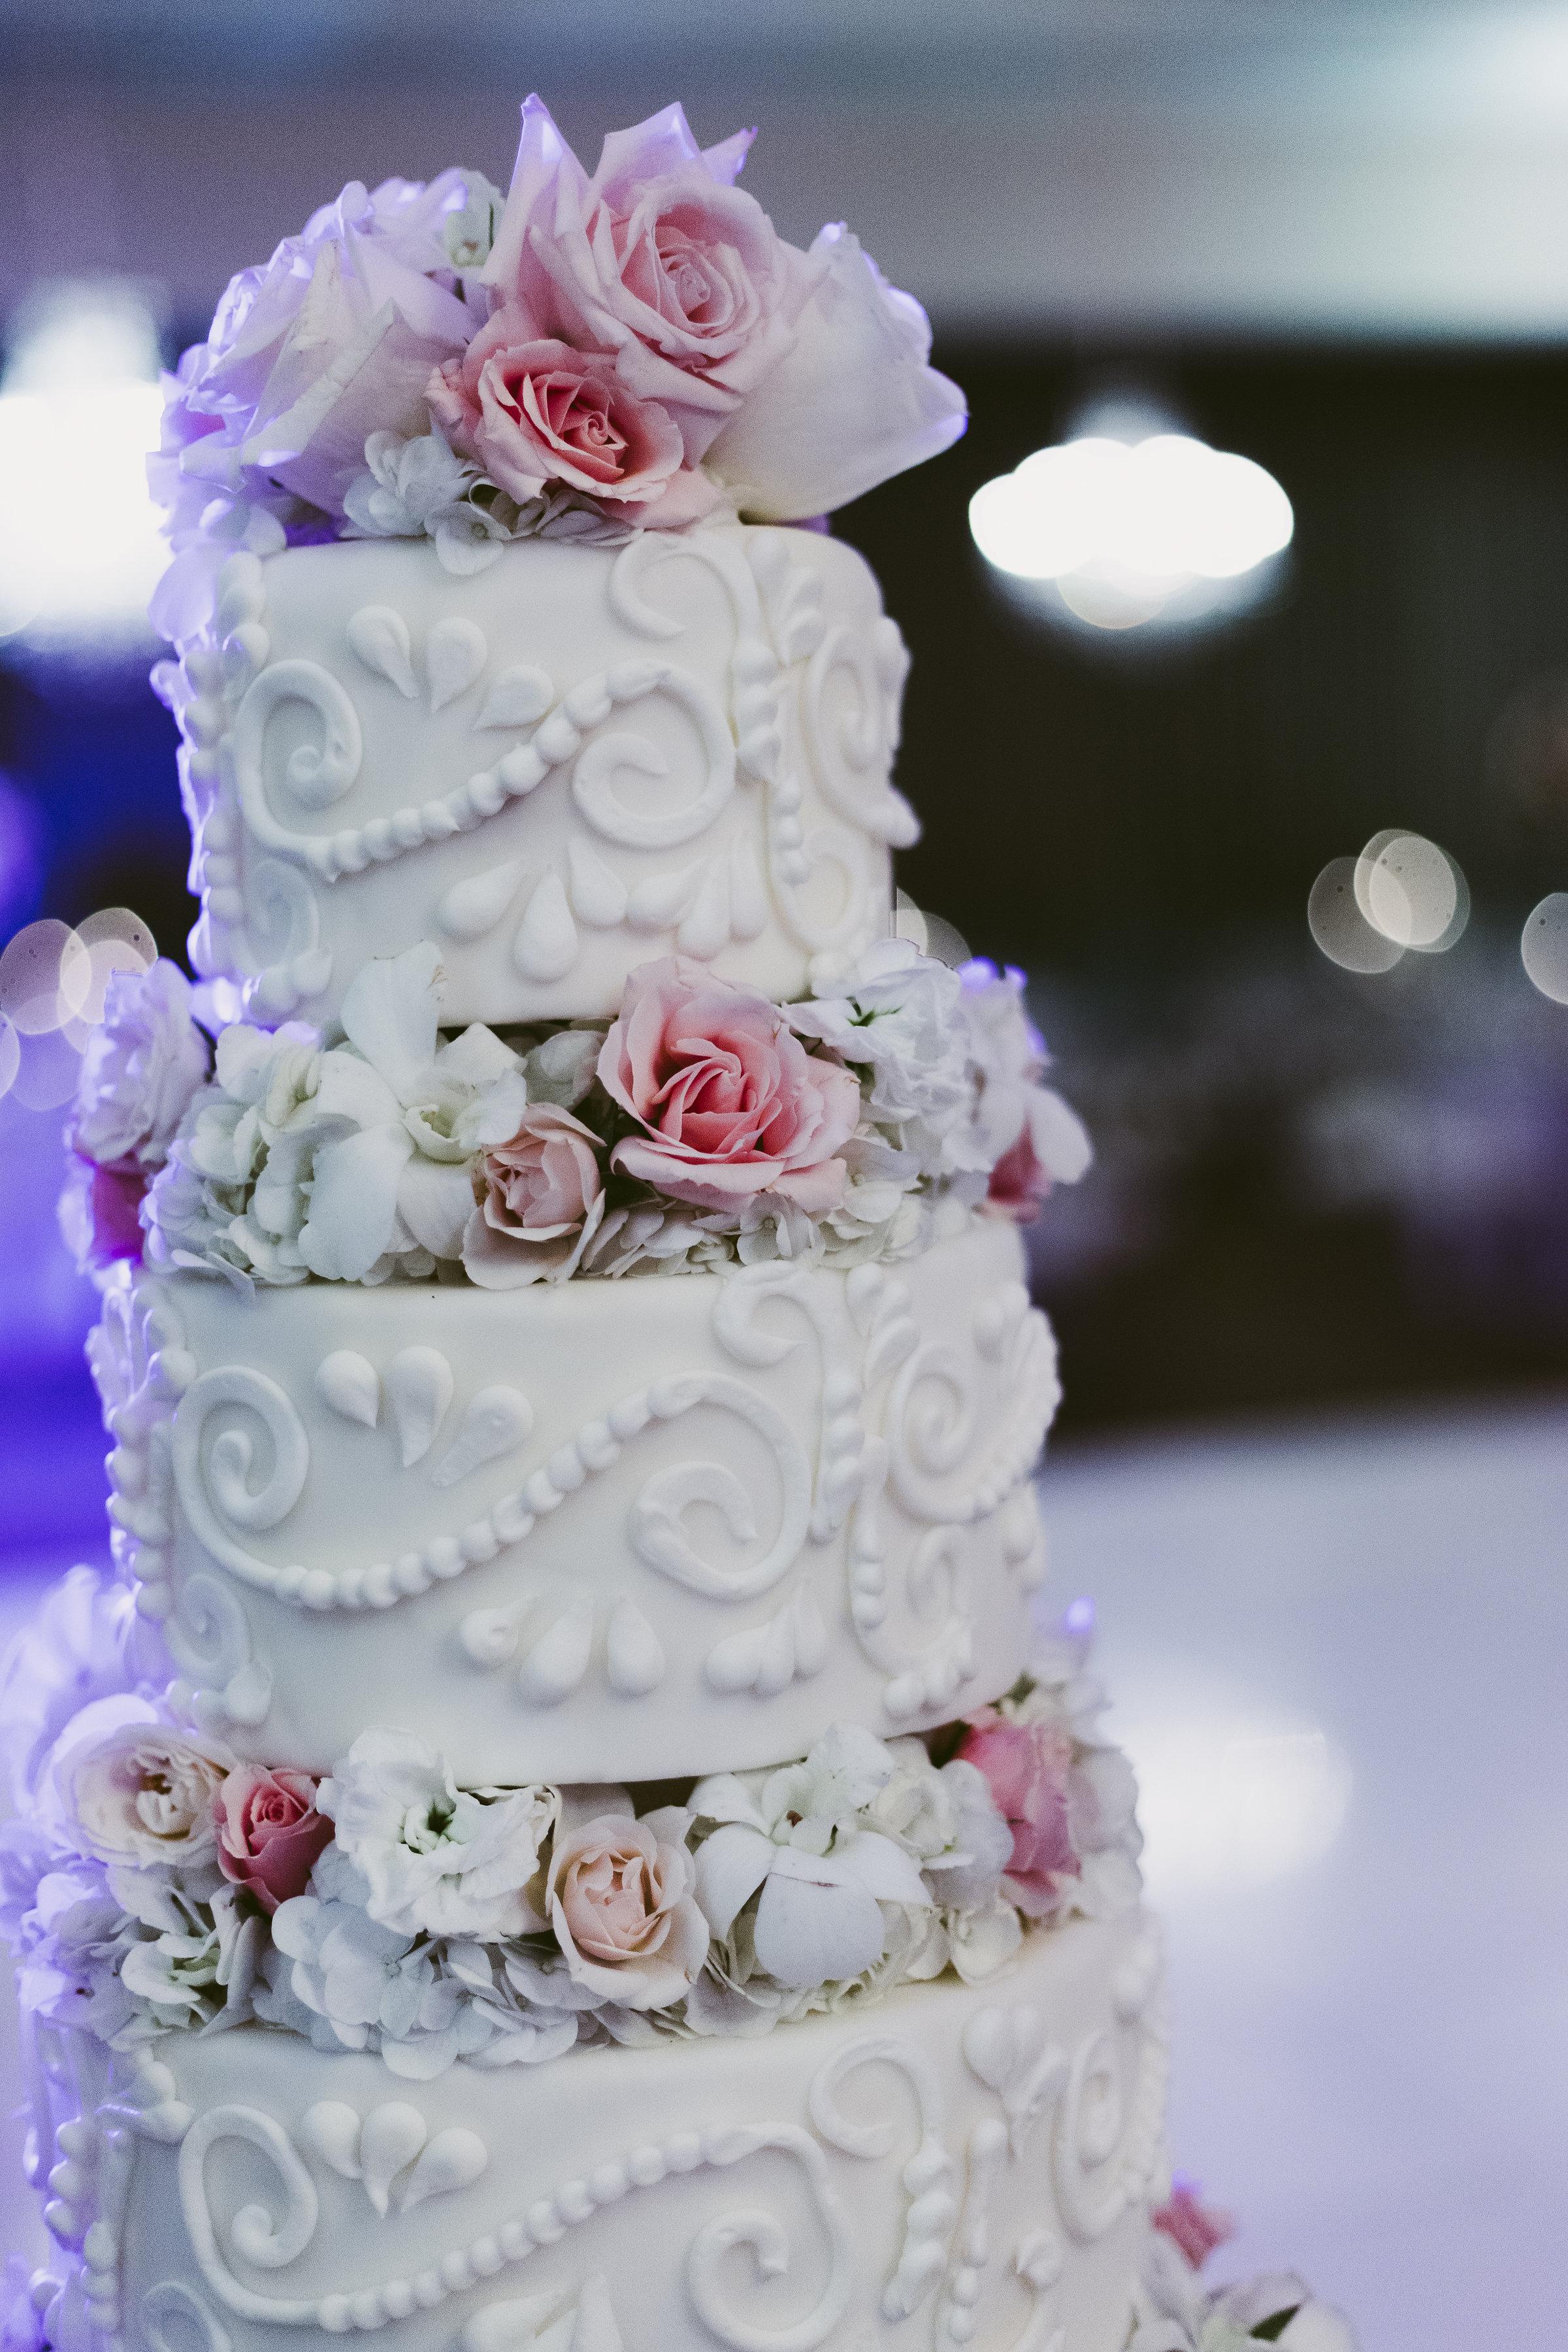 Best Pittsburgh Wedding planners